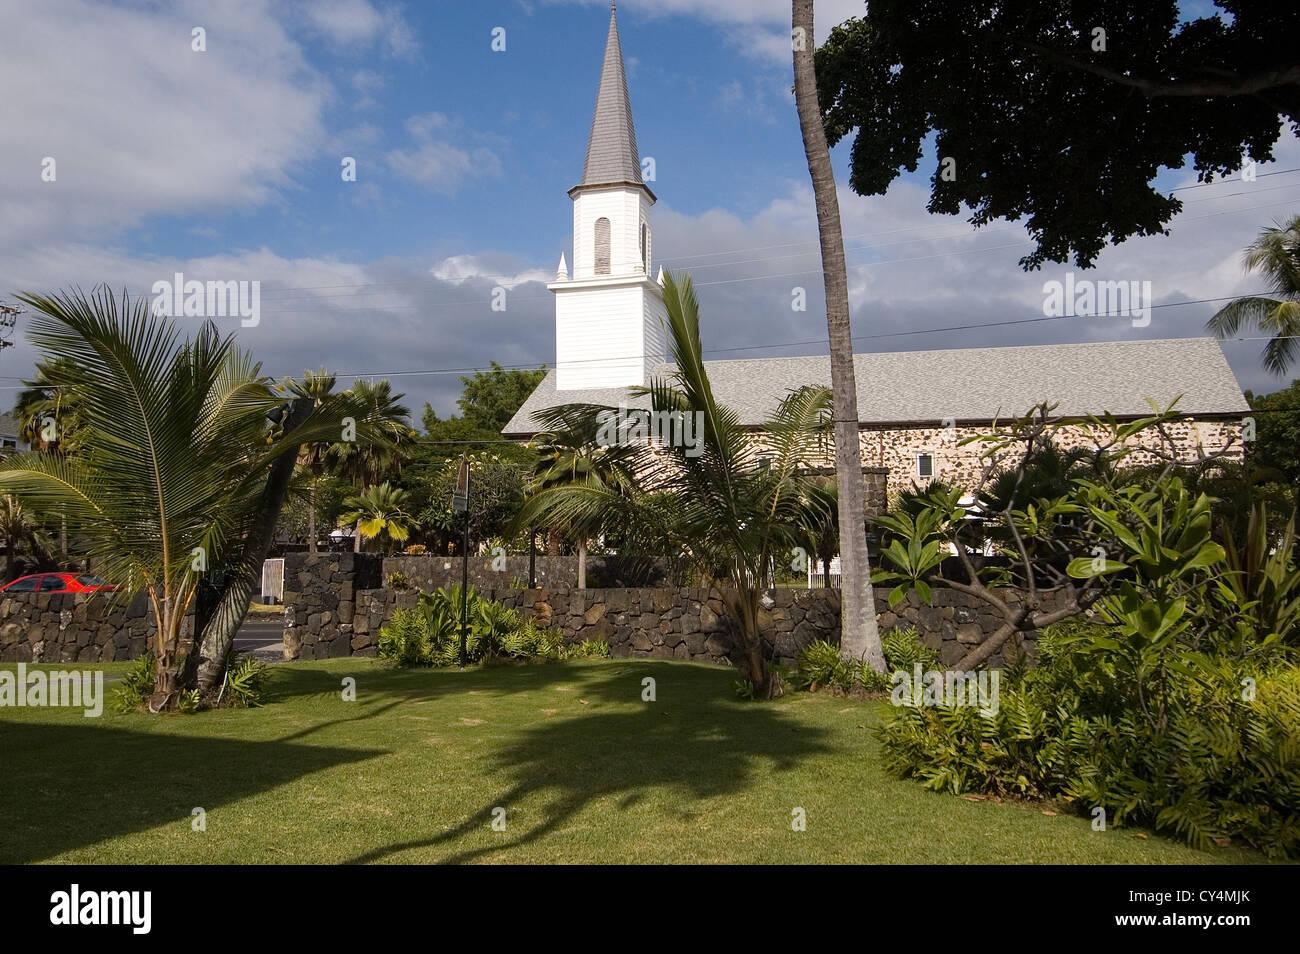 Kailua Kona Stock Photos & Kailua Kona Stock Images - Alamy